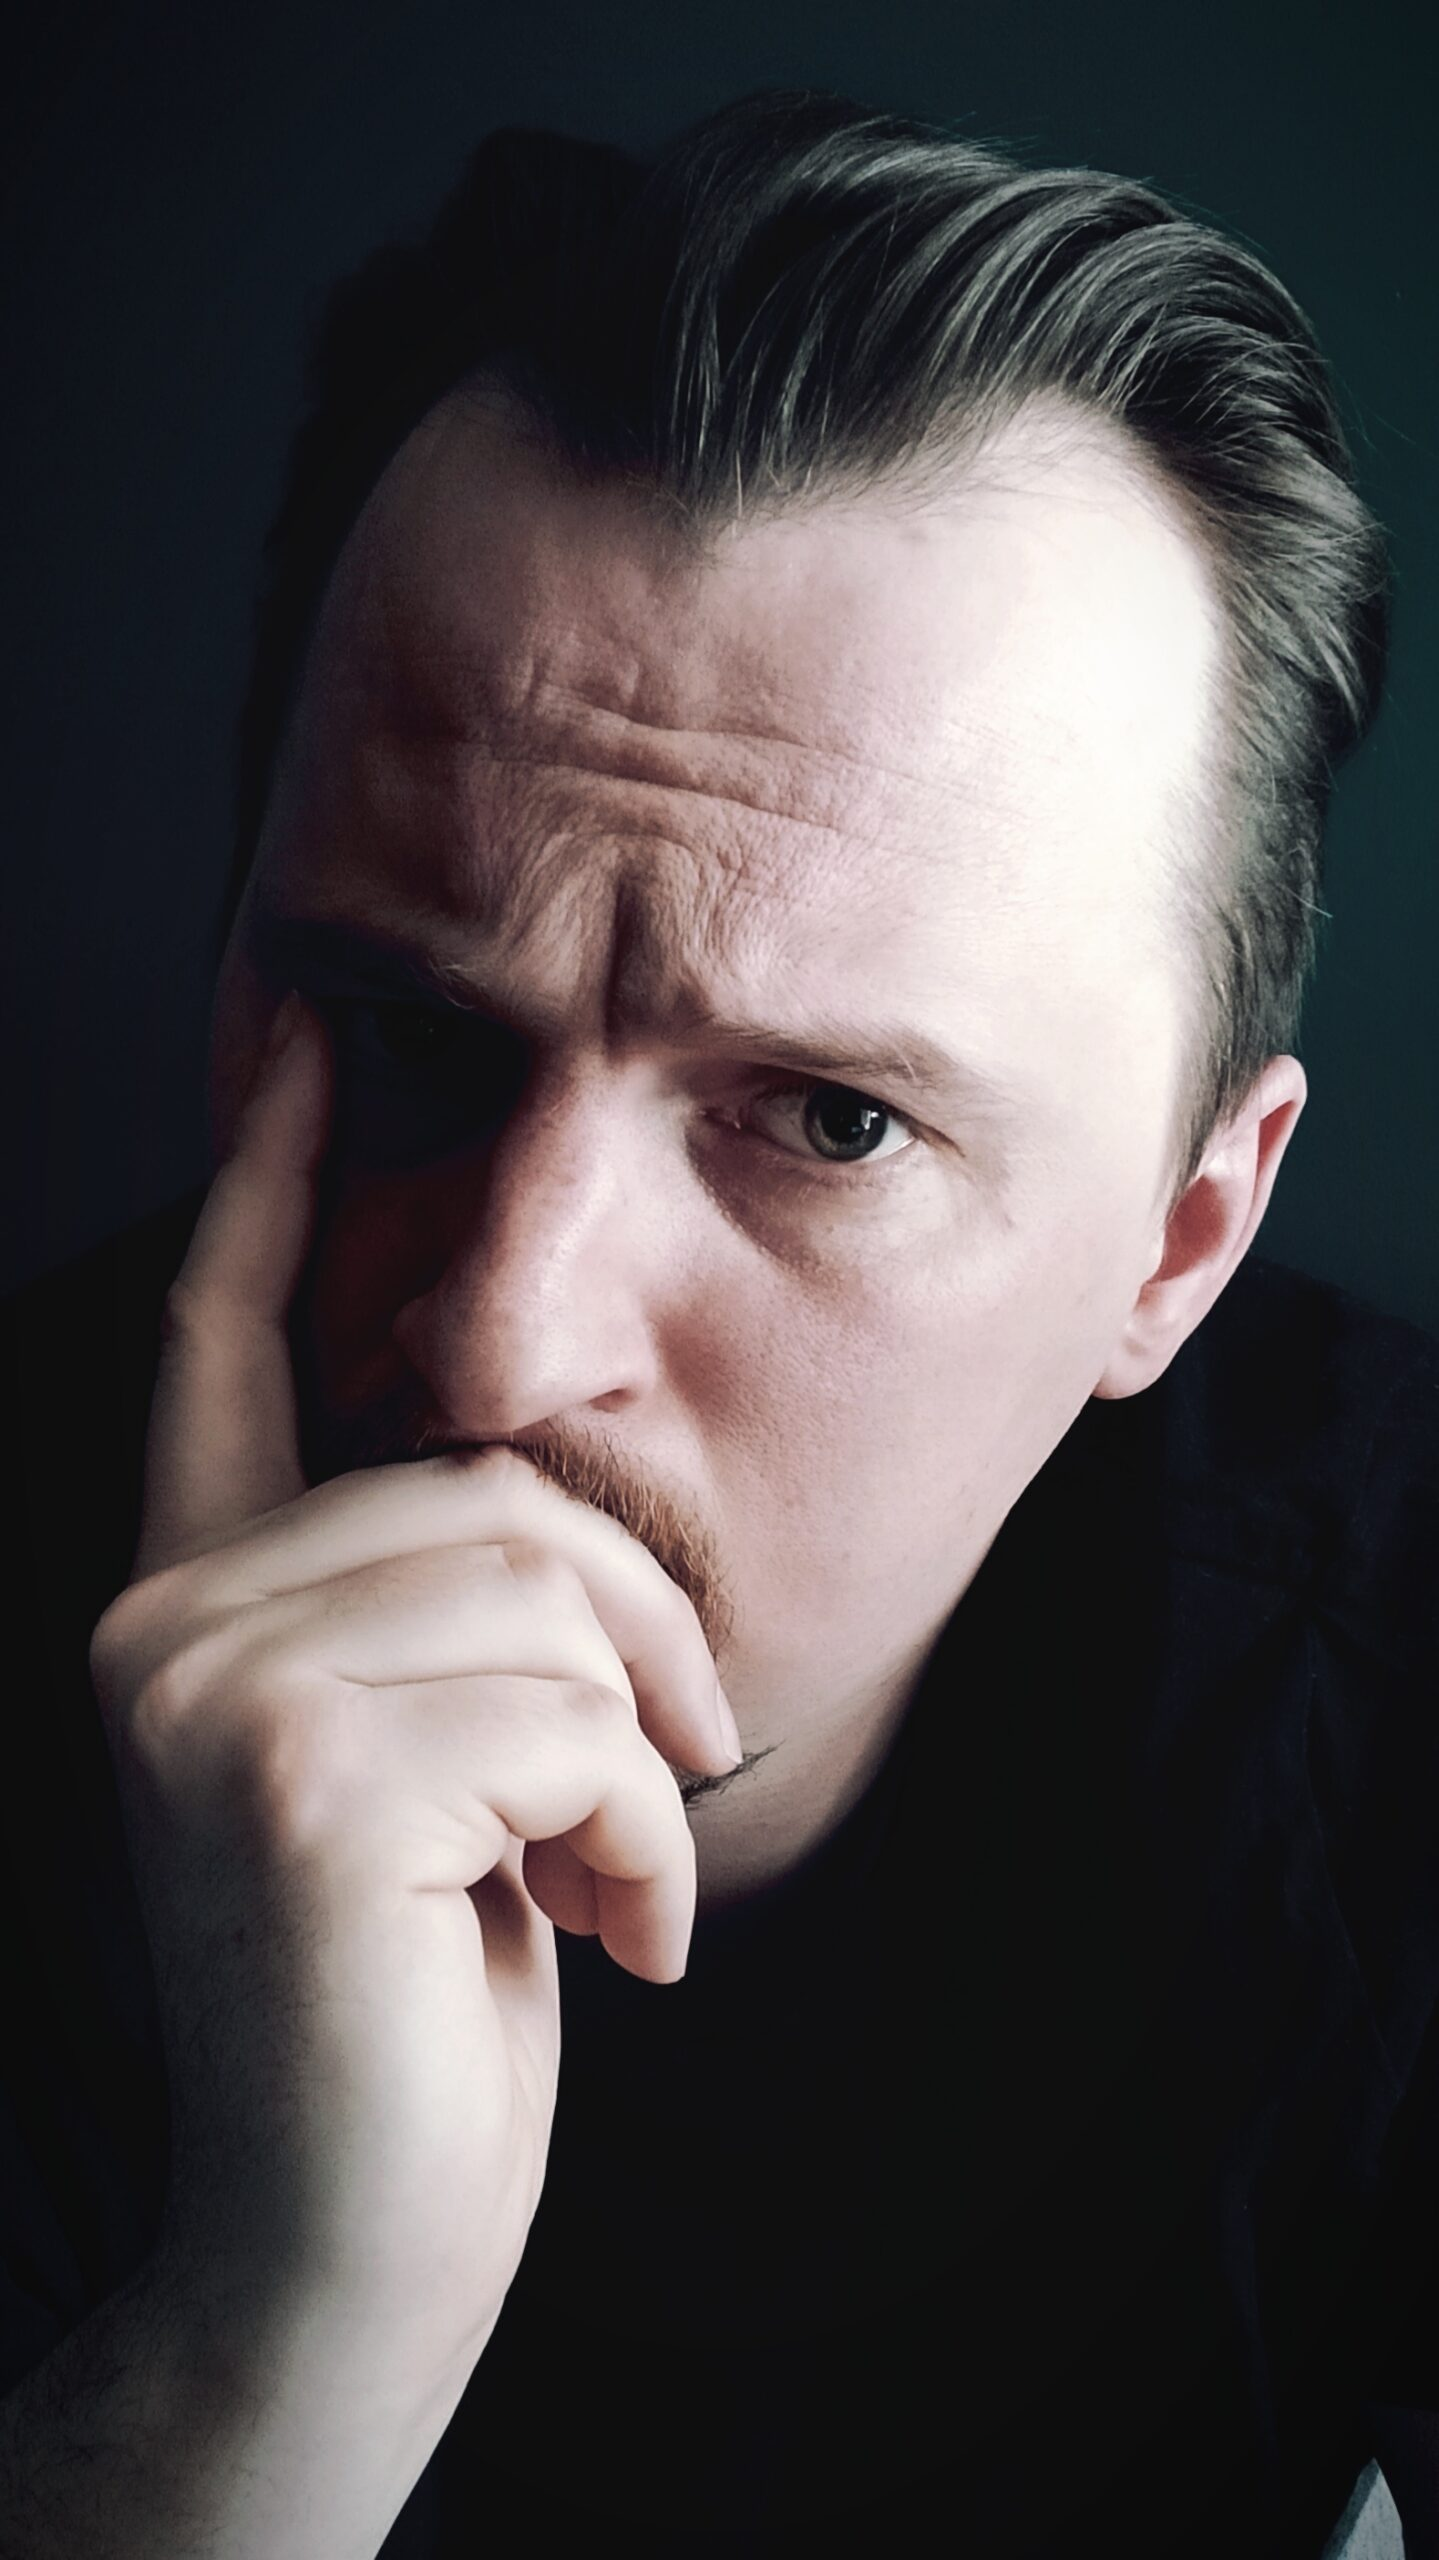 Marcin Plejrum